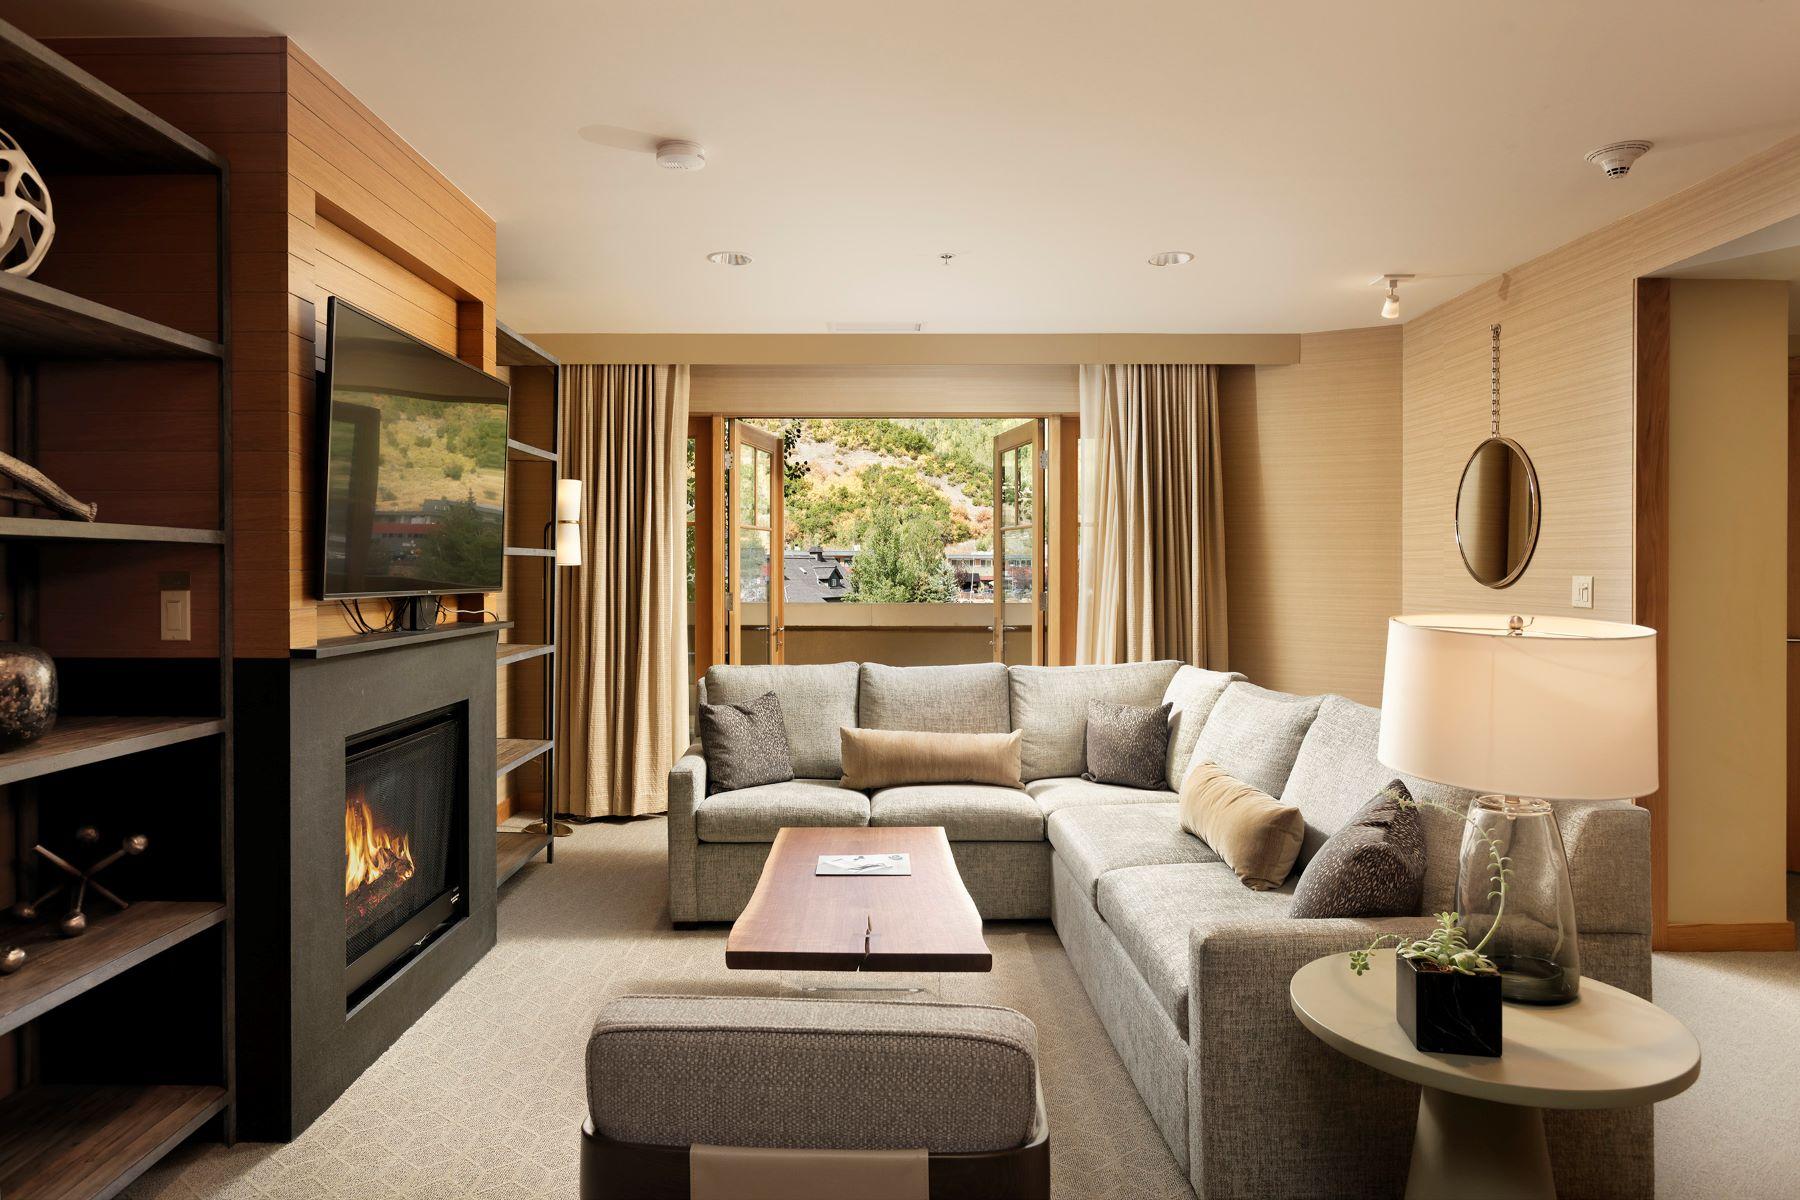 Condominiums для того Продажа на 4 Bedroom Luxury Ski-in/Ski-out Condo 130 Wood Road, Unit 214, Snowmass Village, Колорадо 81615 Соединенные Штаты